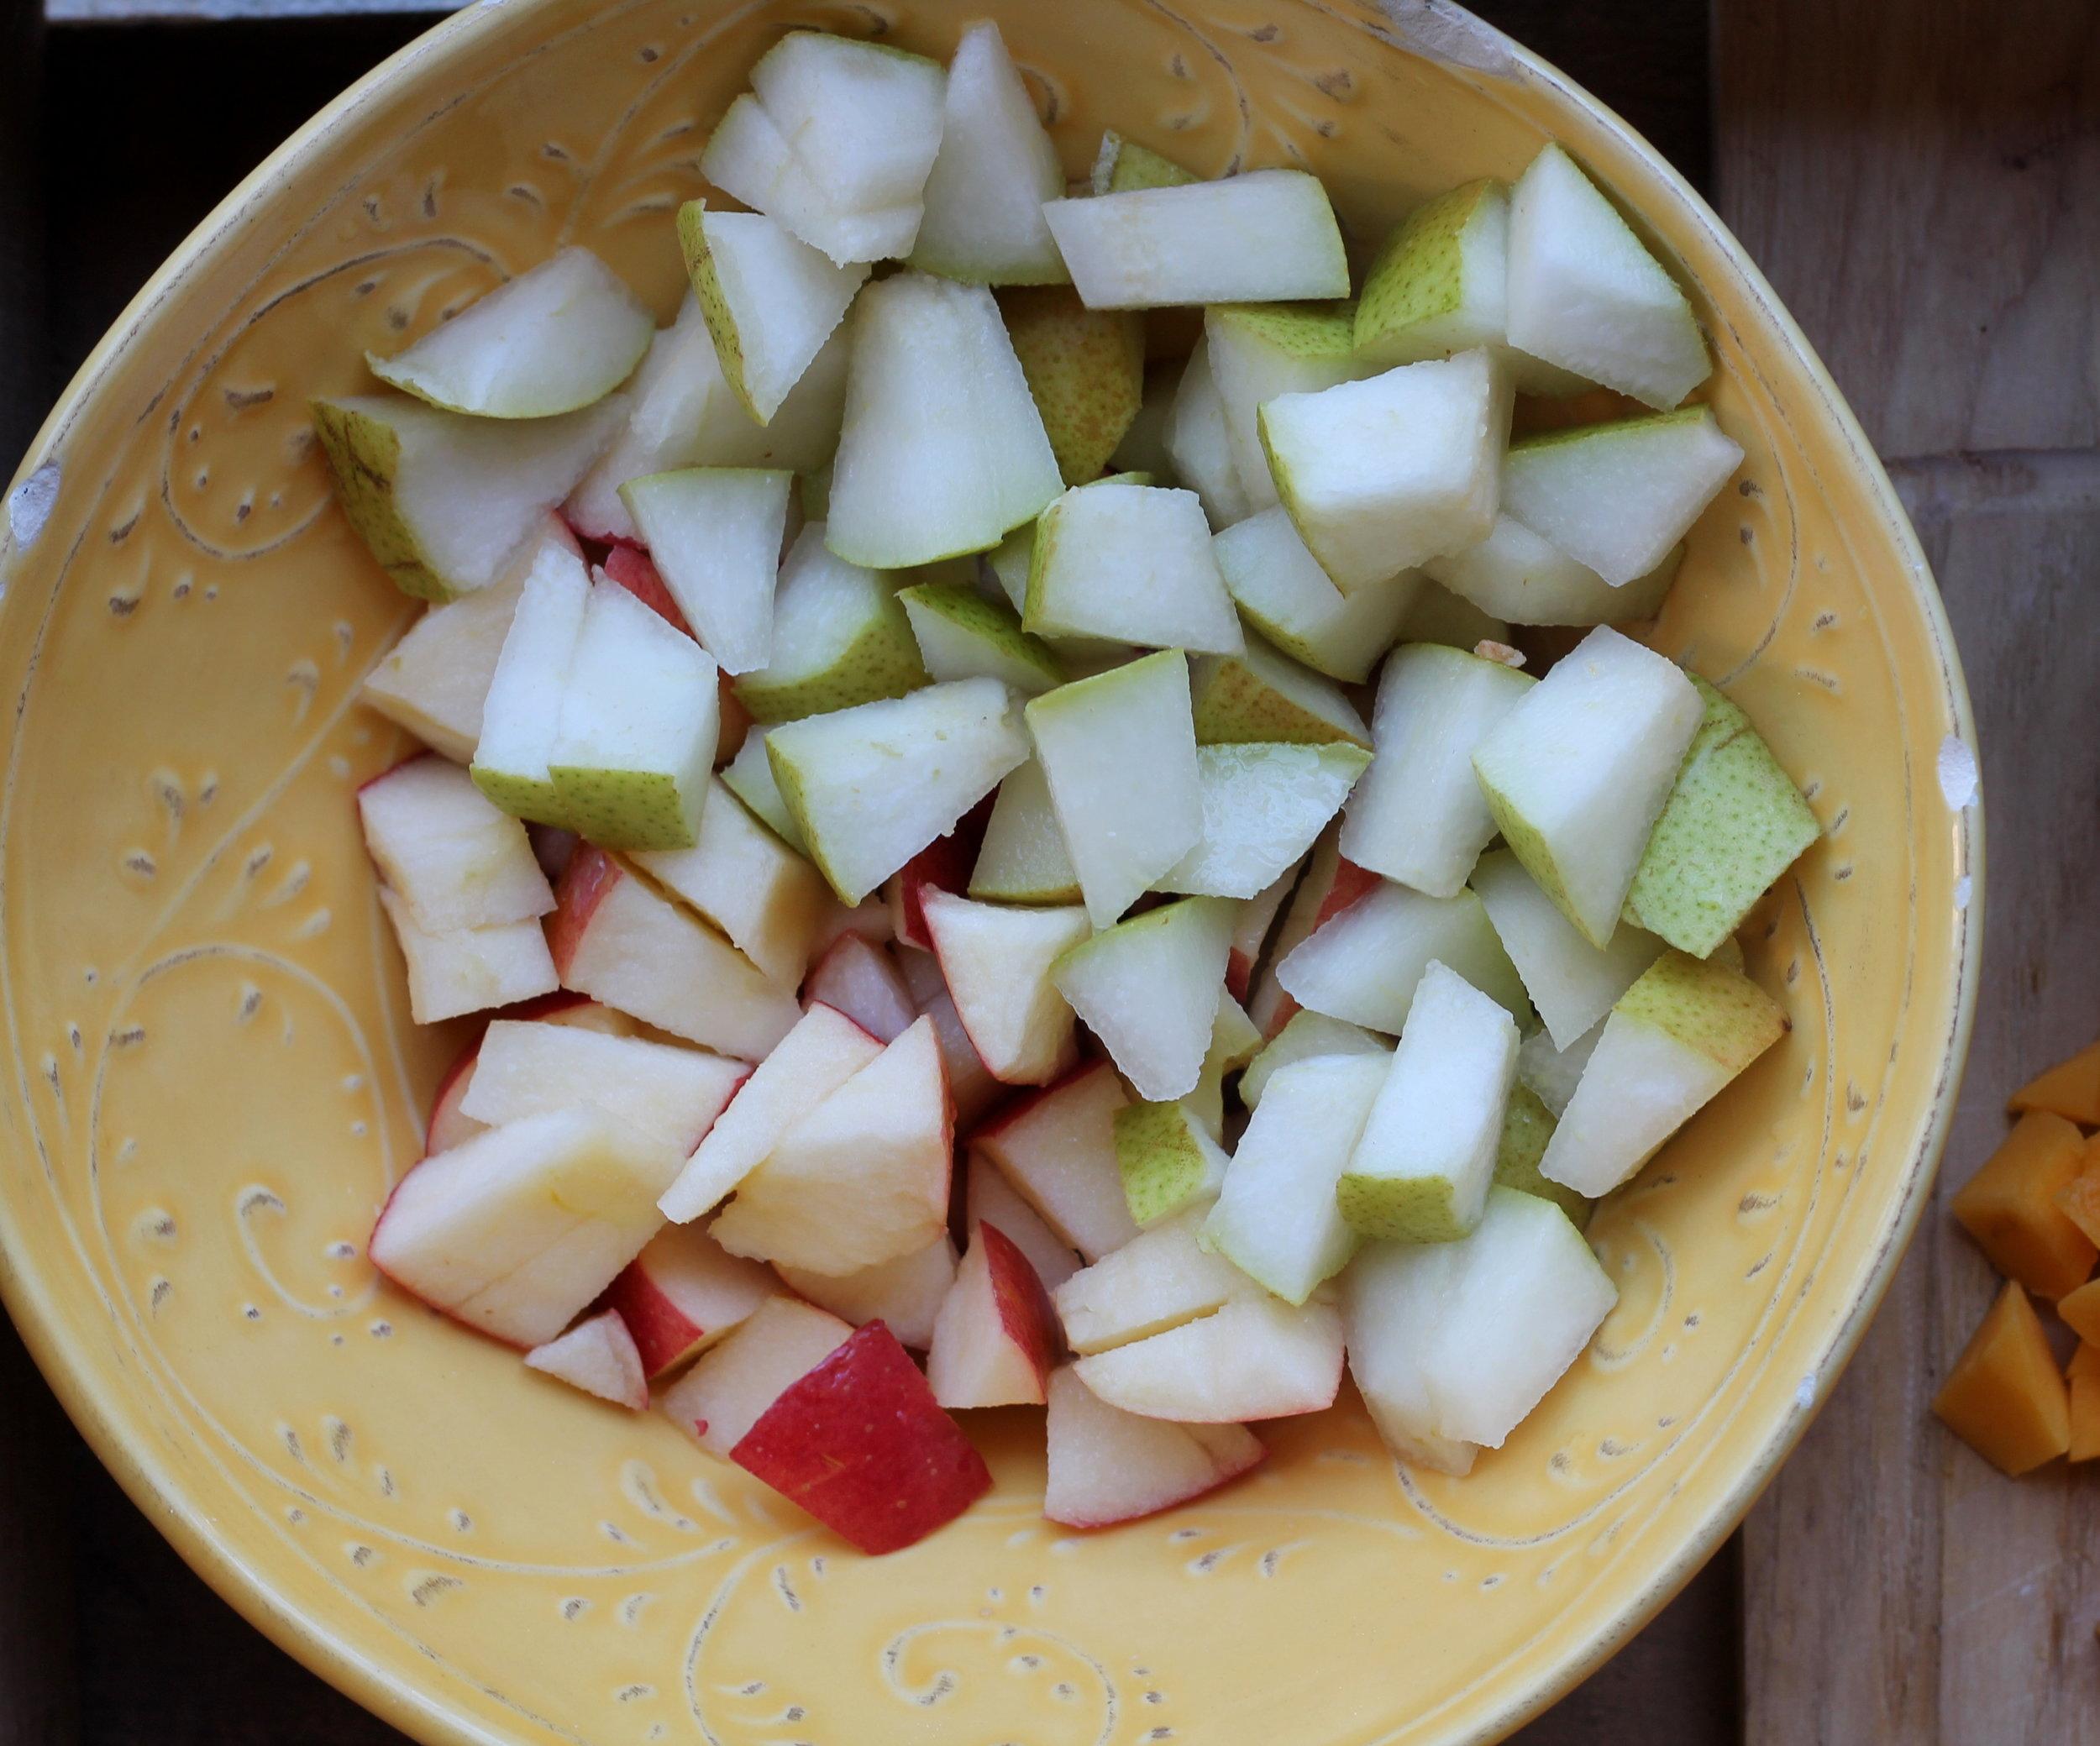 tangyfruitsalad3